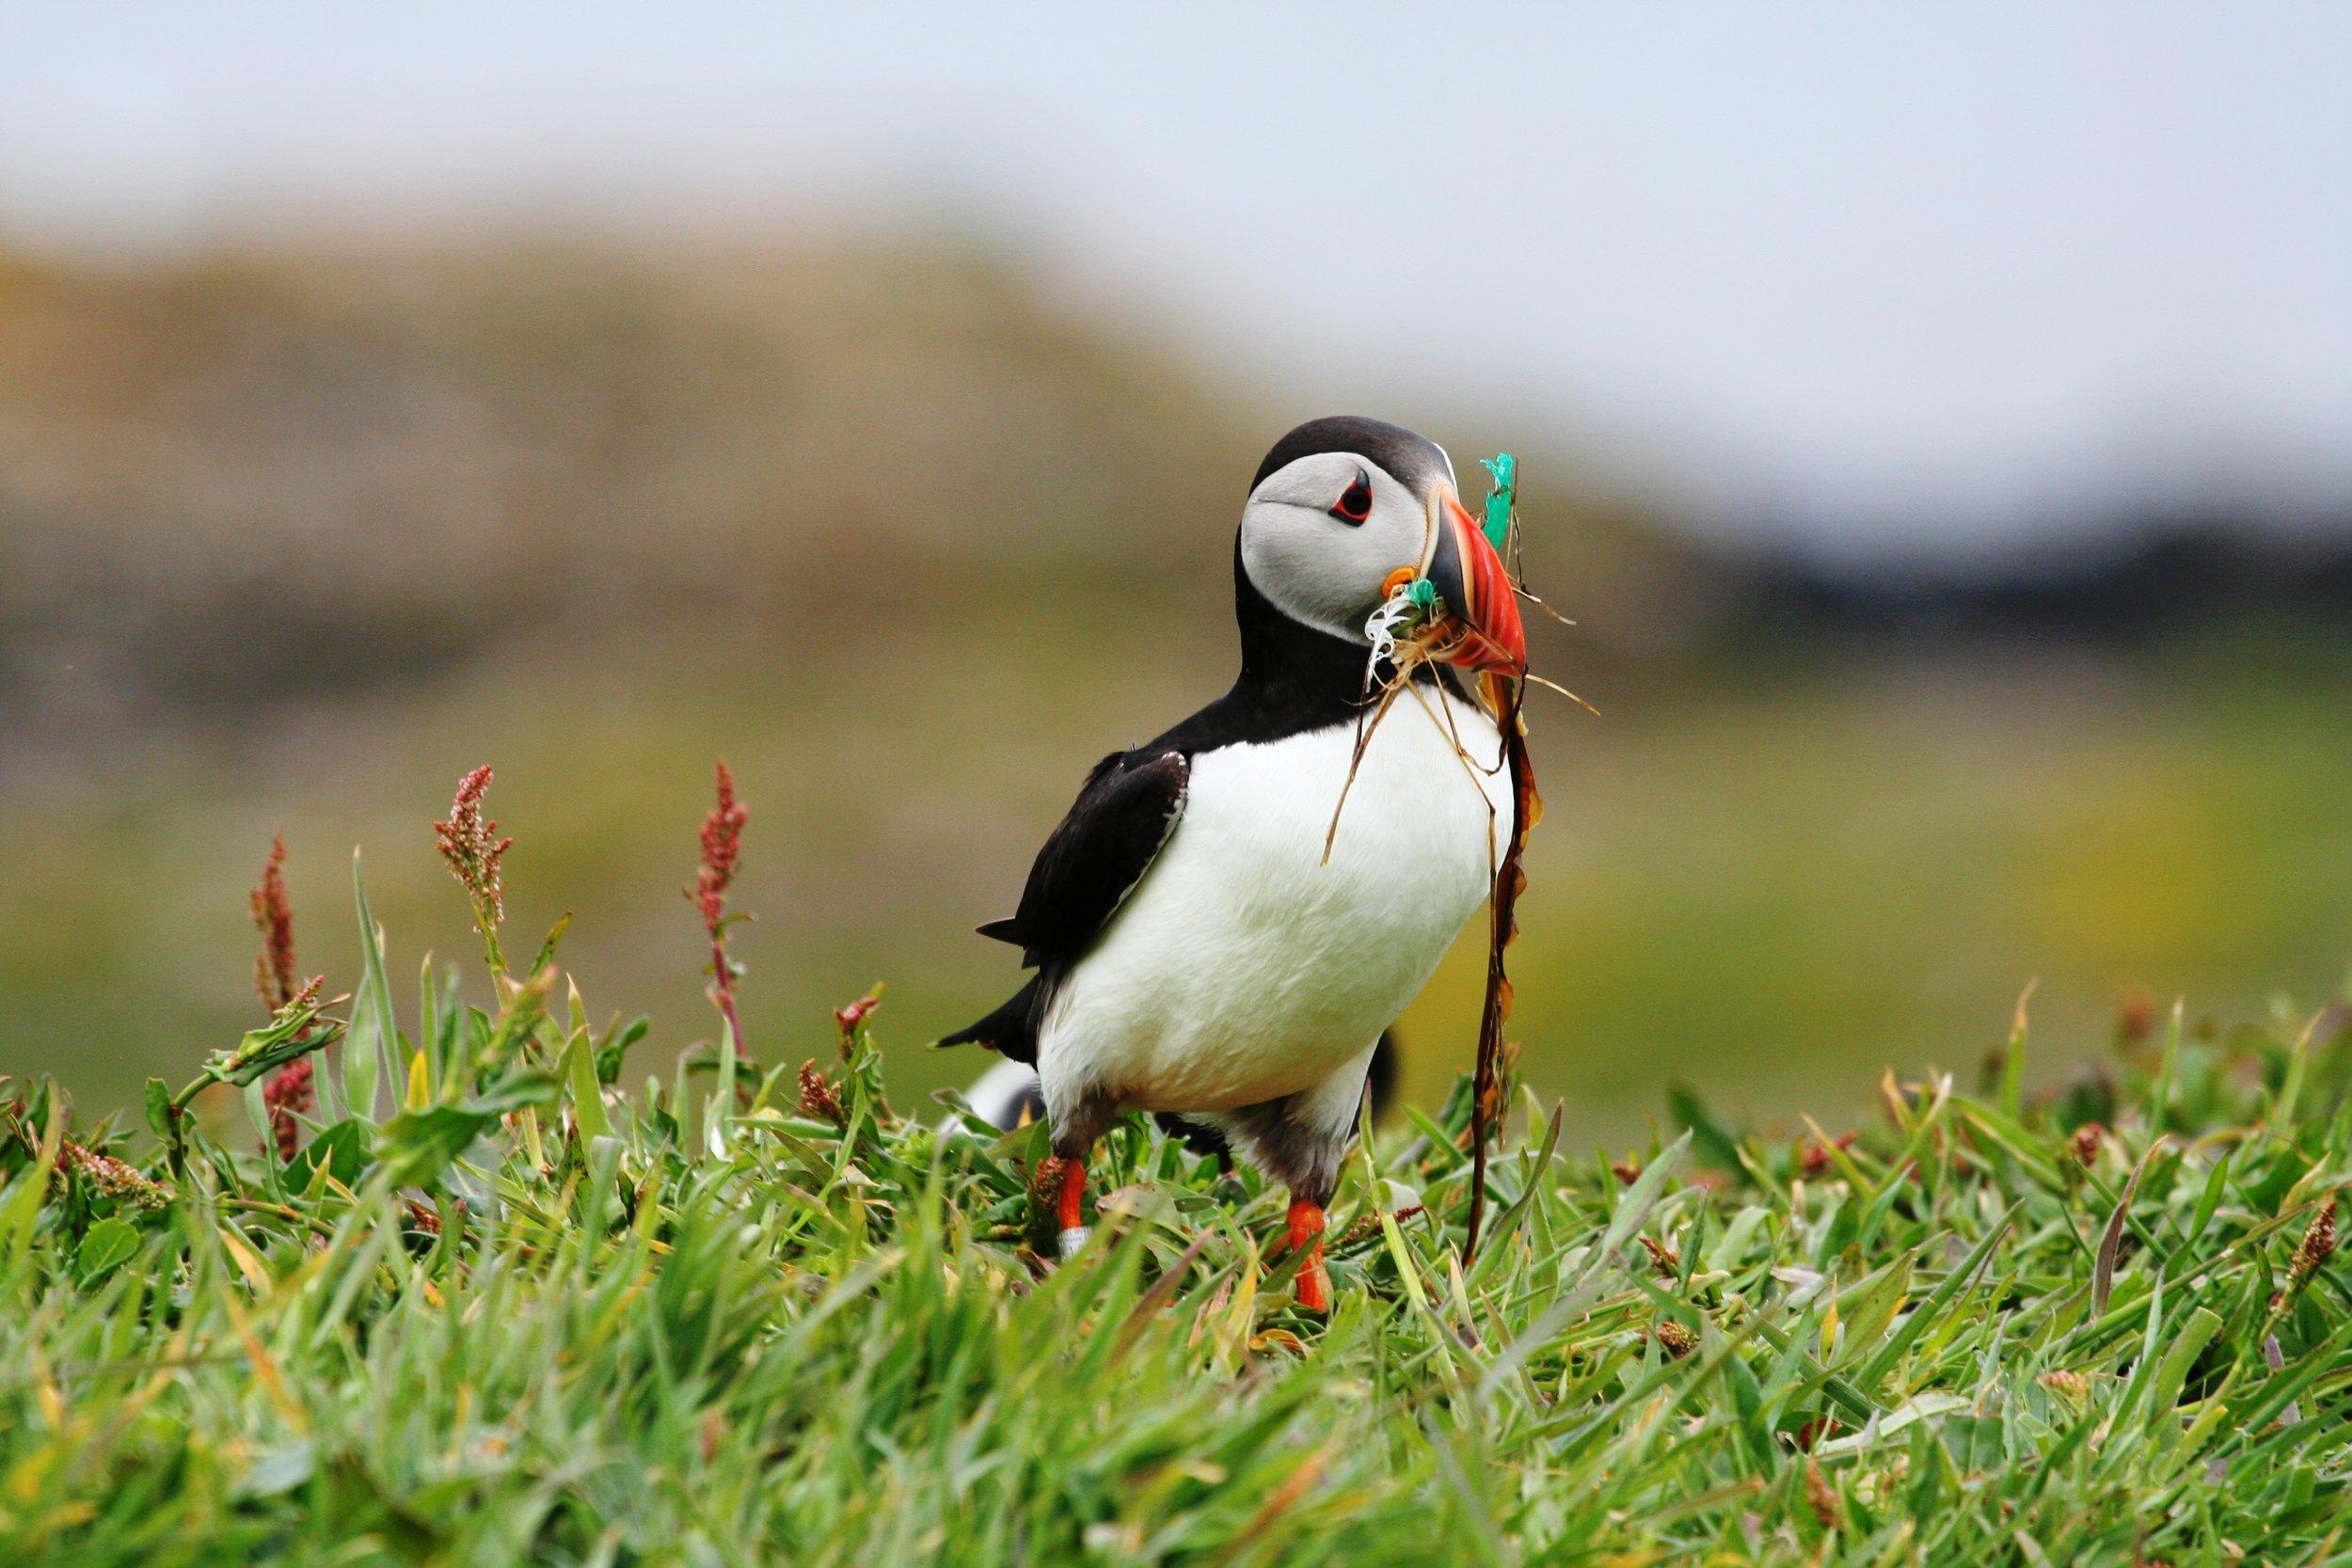 A playful puffin poses. Photo: Turus Mara